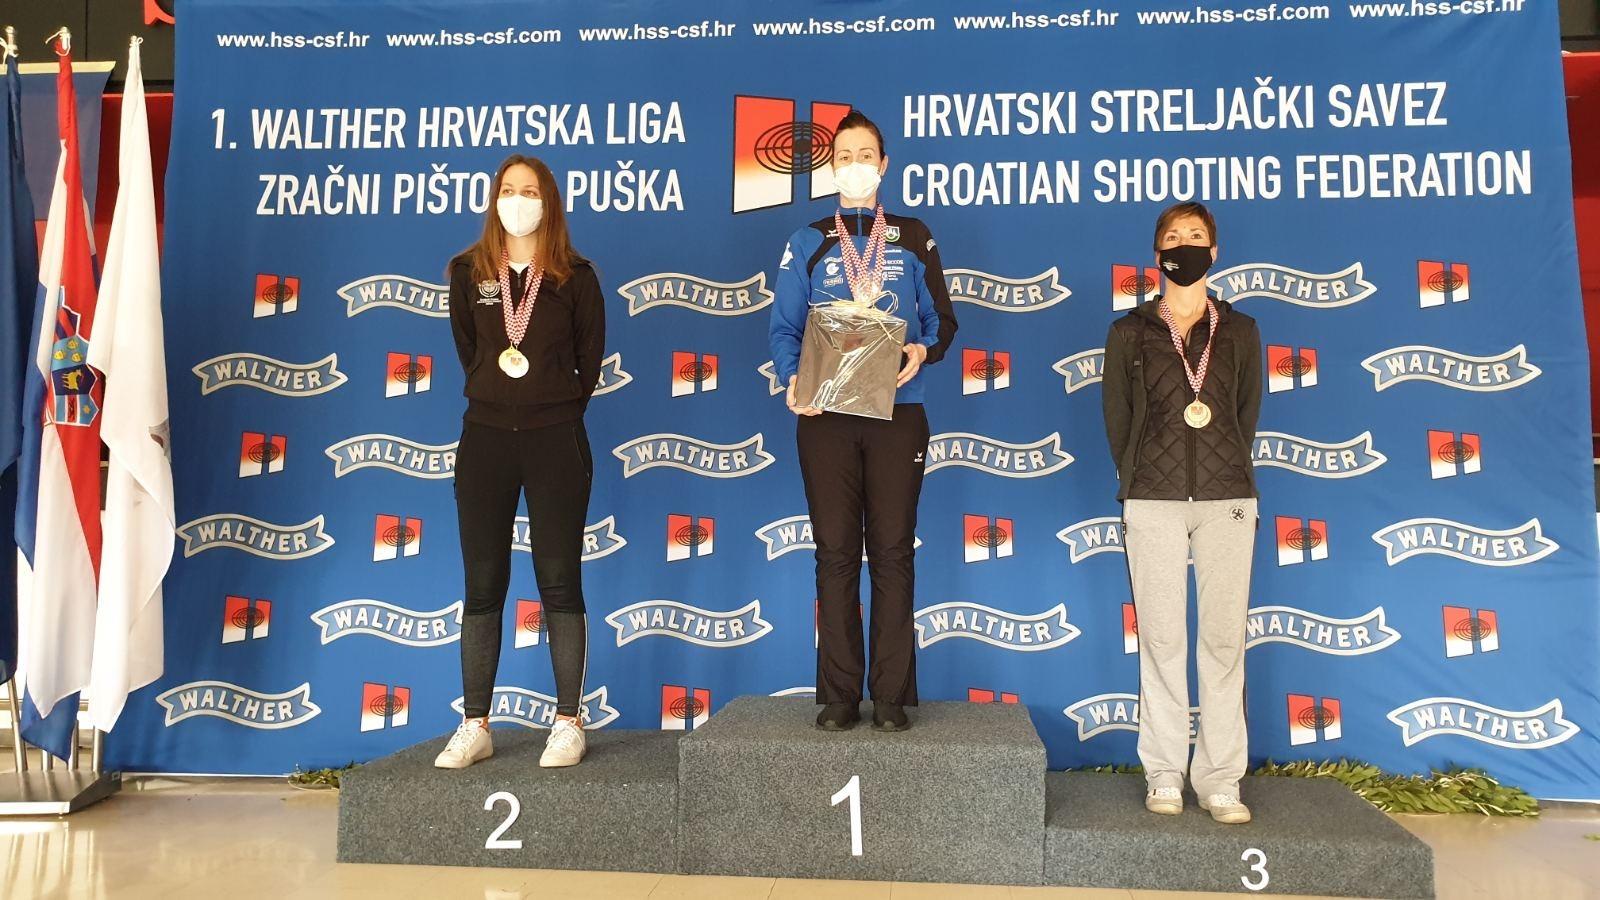 Zlatka Hlebec brončana na prvenstvu Hrvatske! Bravo Zlatka!